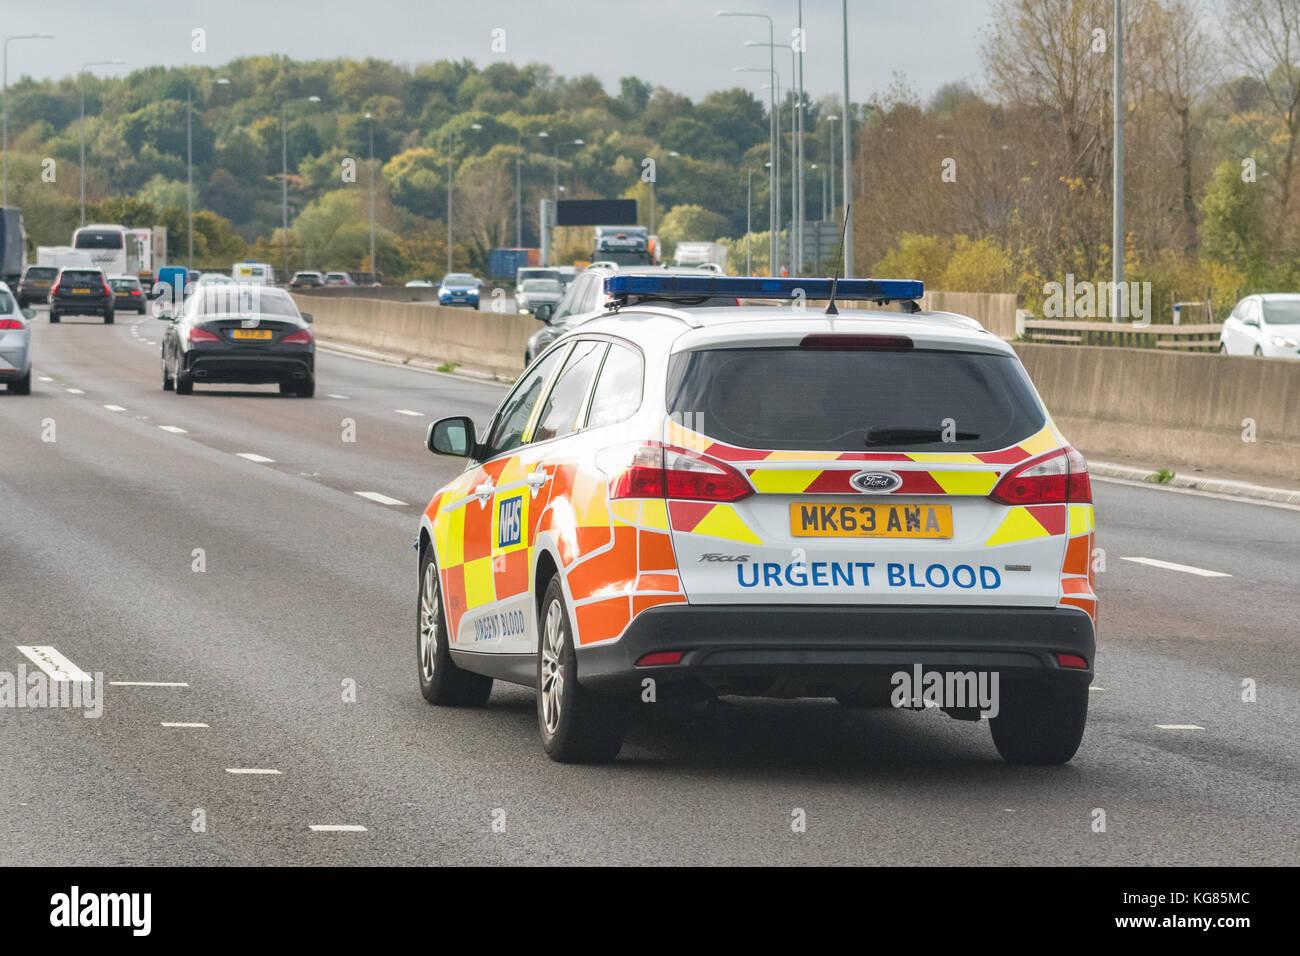 NHS Blut Transport service Einsatzfahrzeug-UK Stockbild